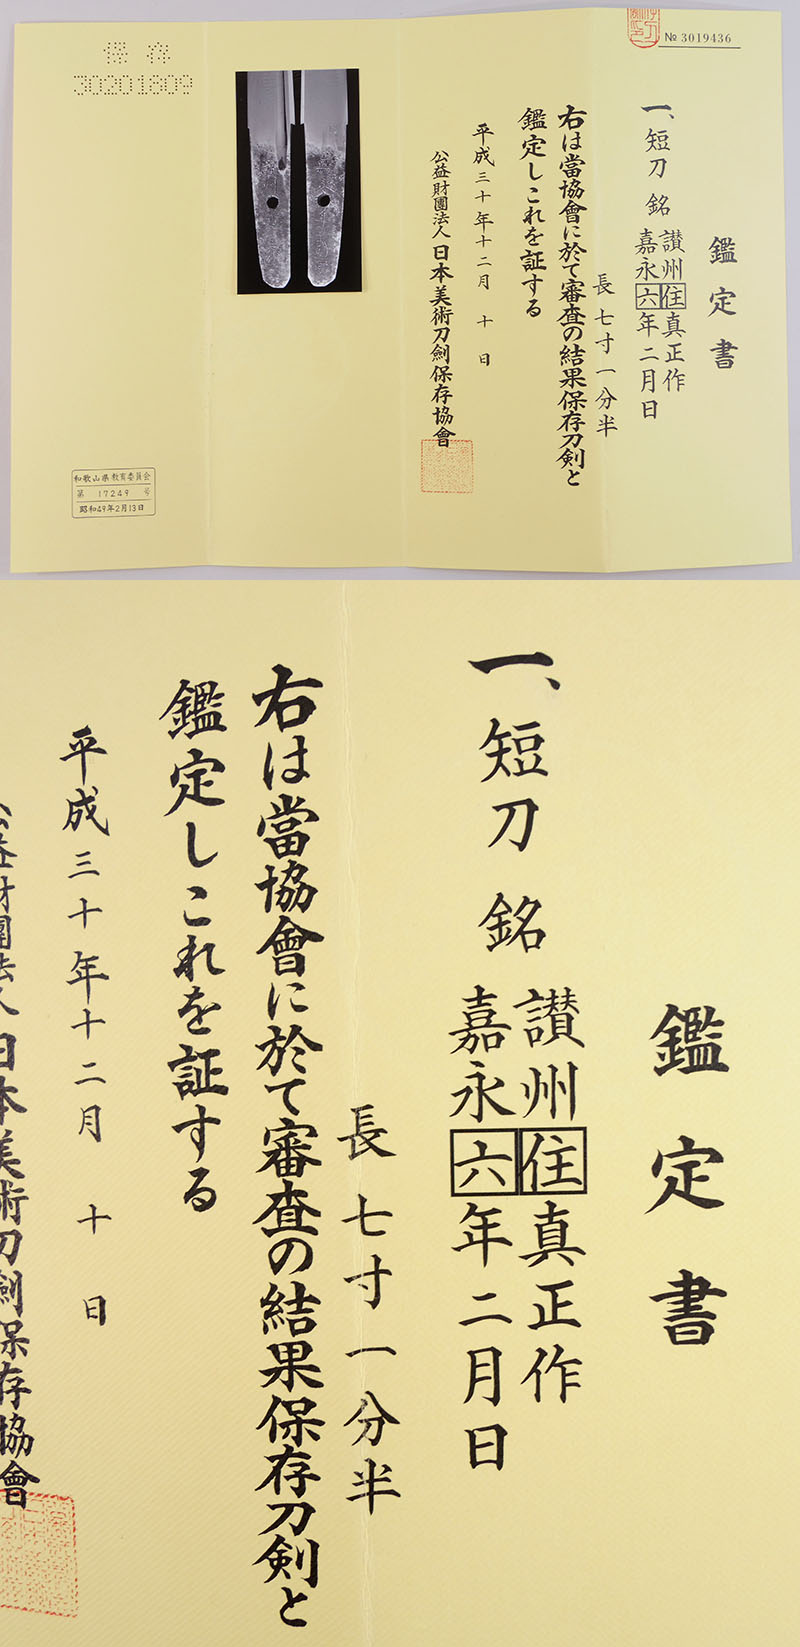 讃州住真正作 Picture of Certificate